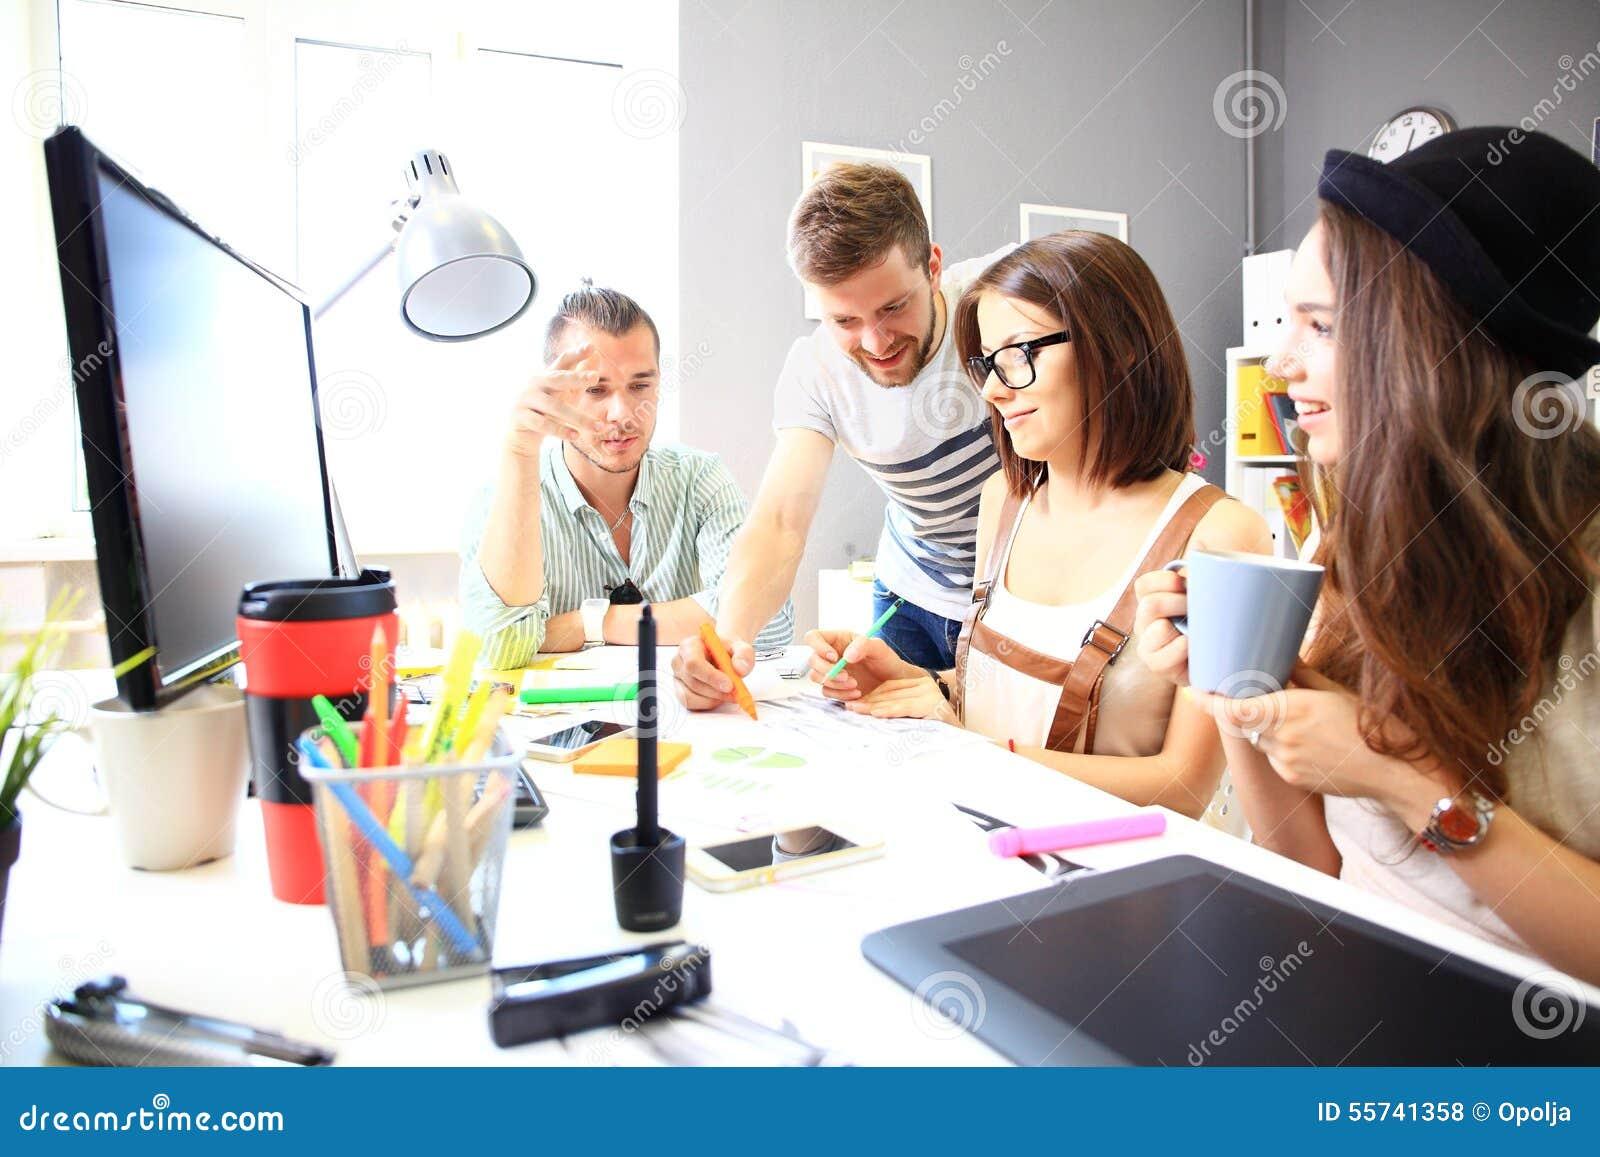 Vergadering van medewerkers en plannings volgende stappen van het werk